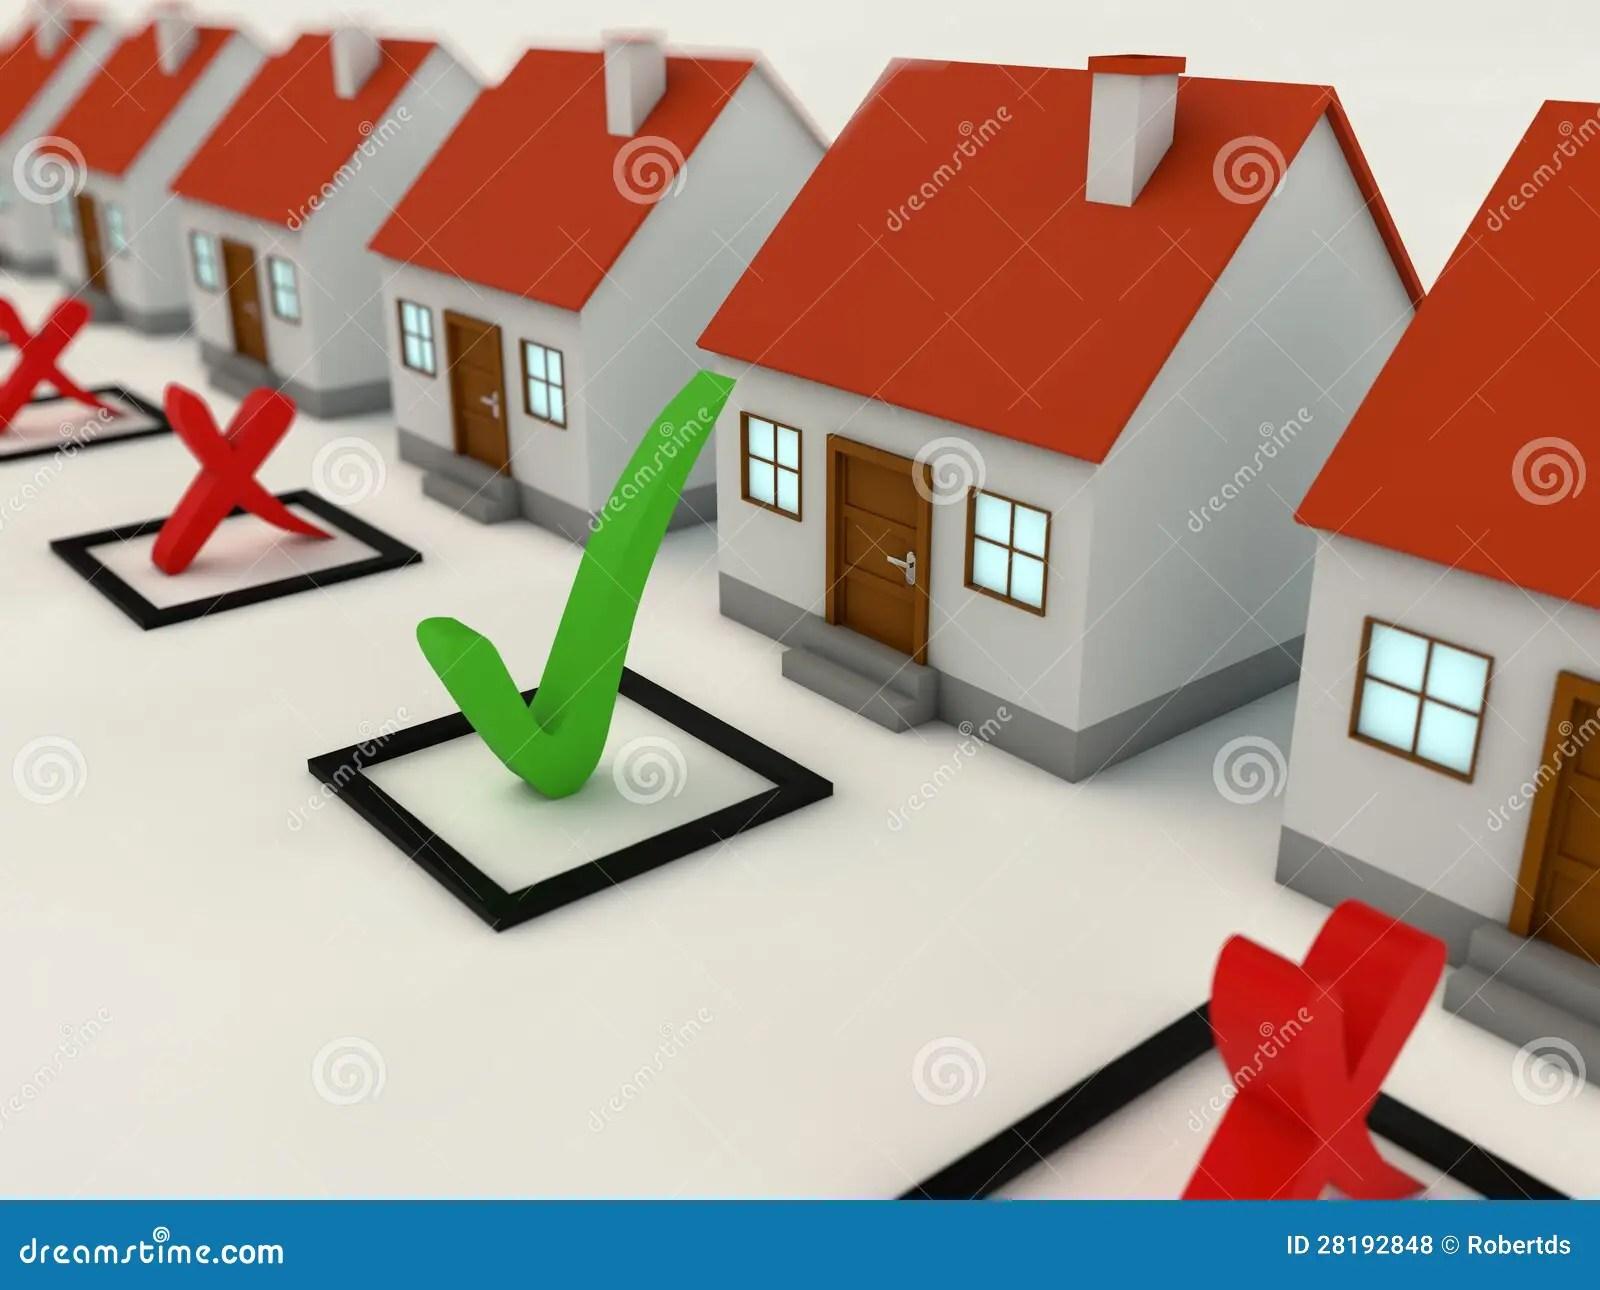 Choosing The Best House